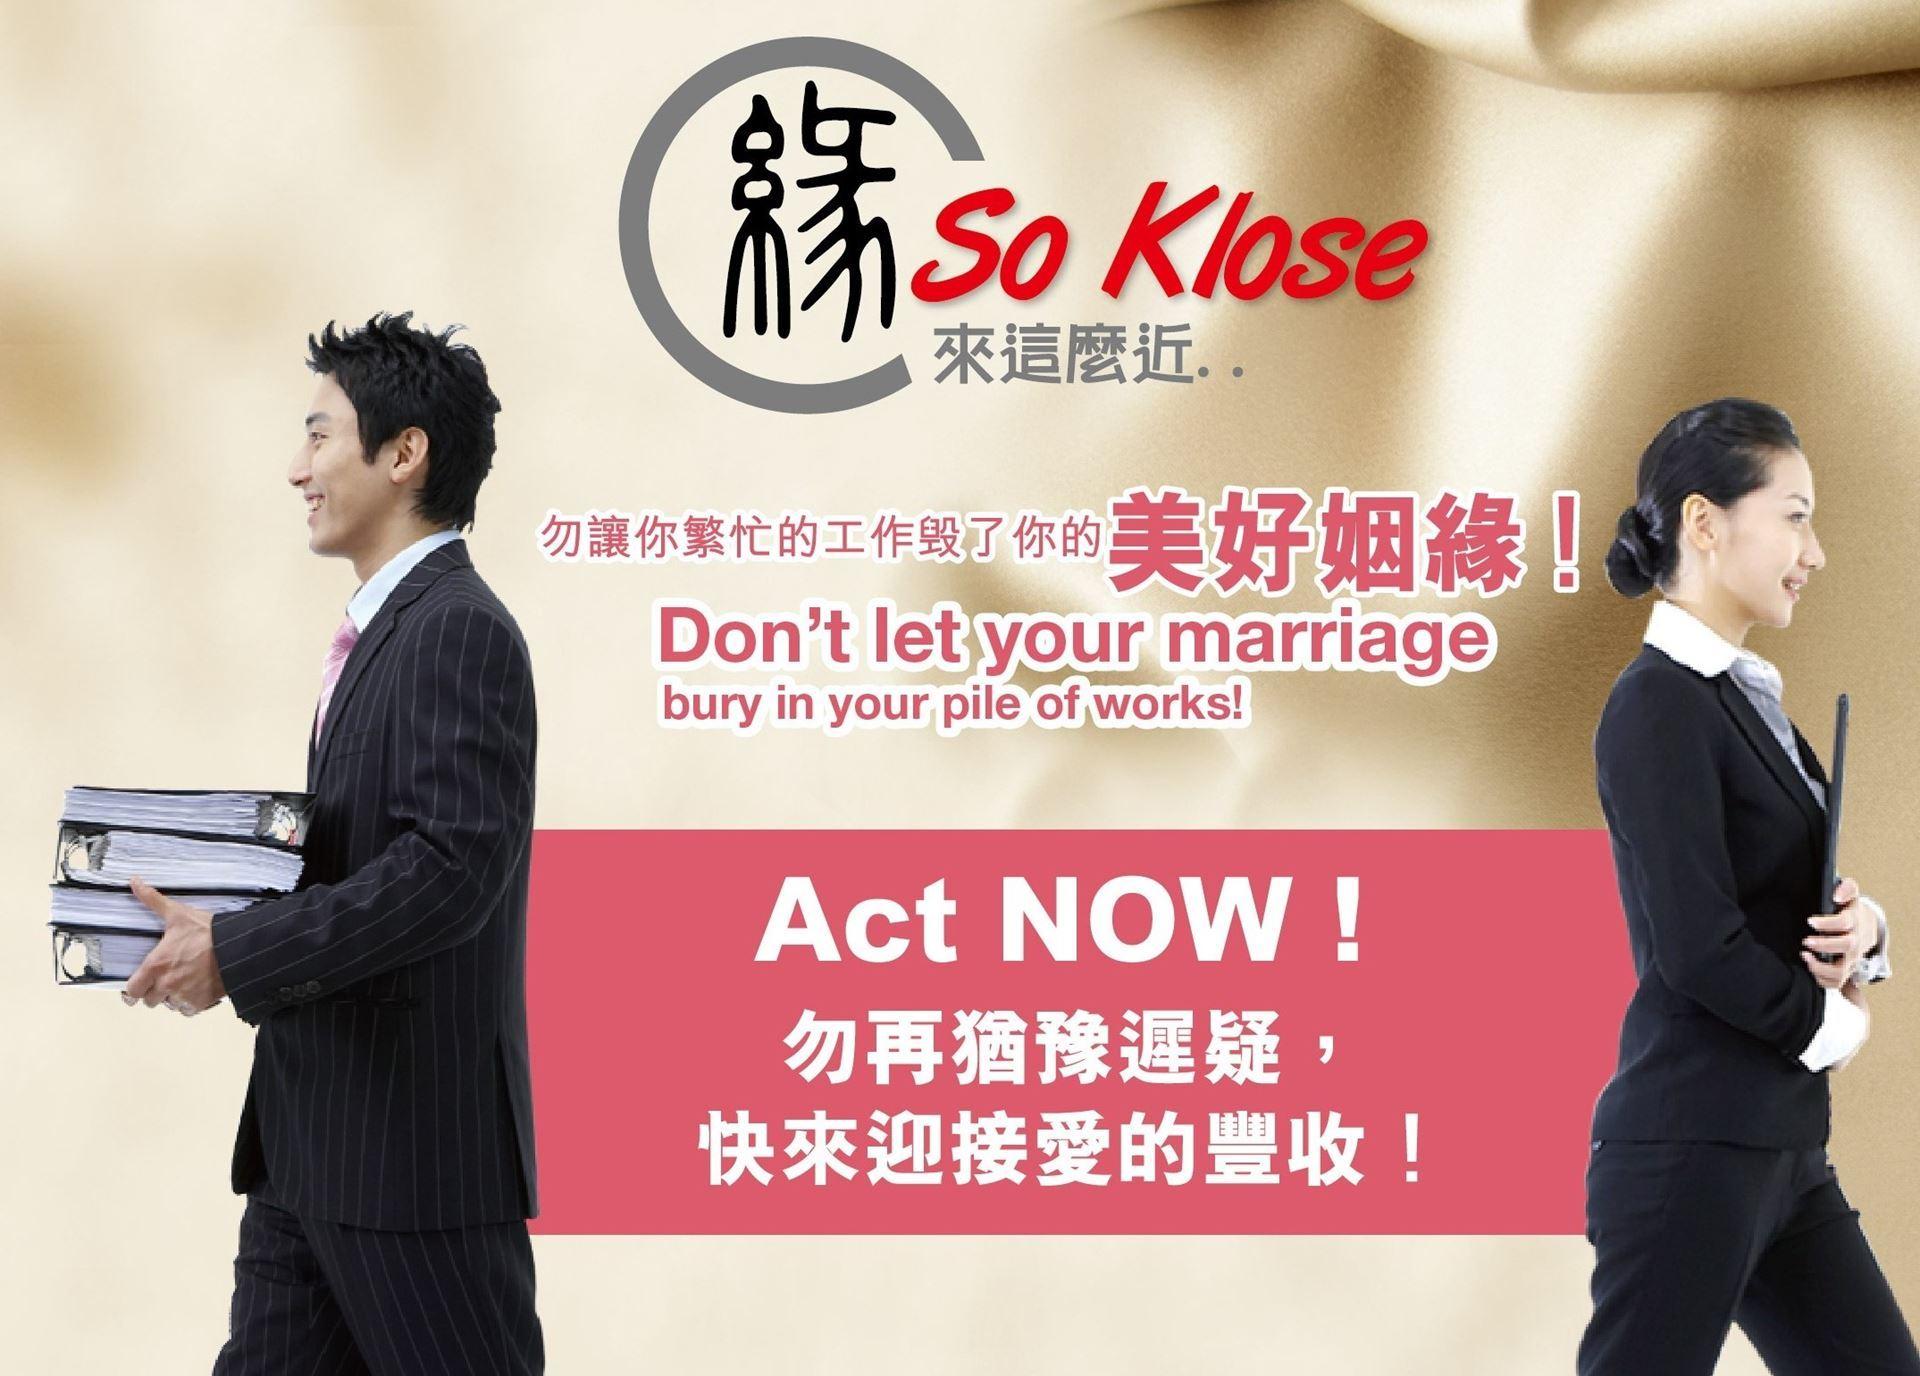 elite international dating agency gratis top dating sites i Indien